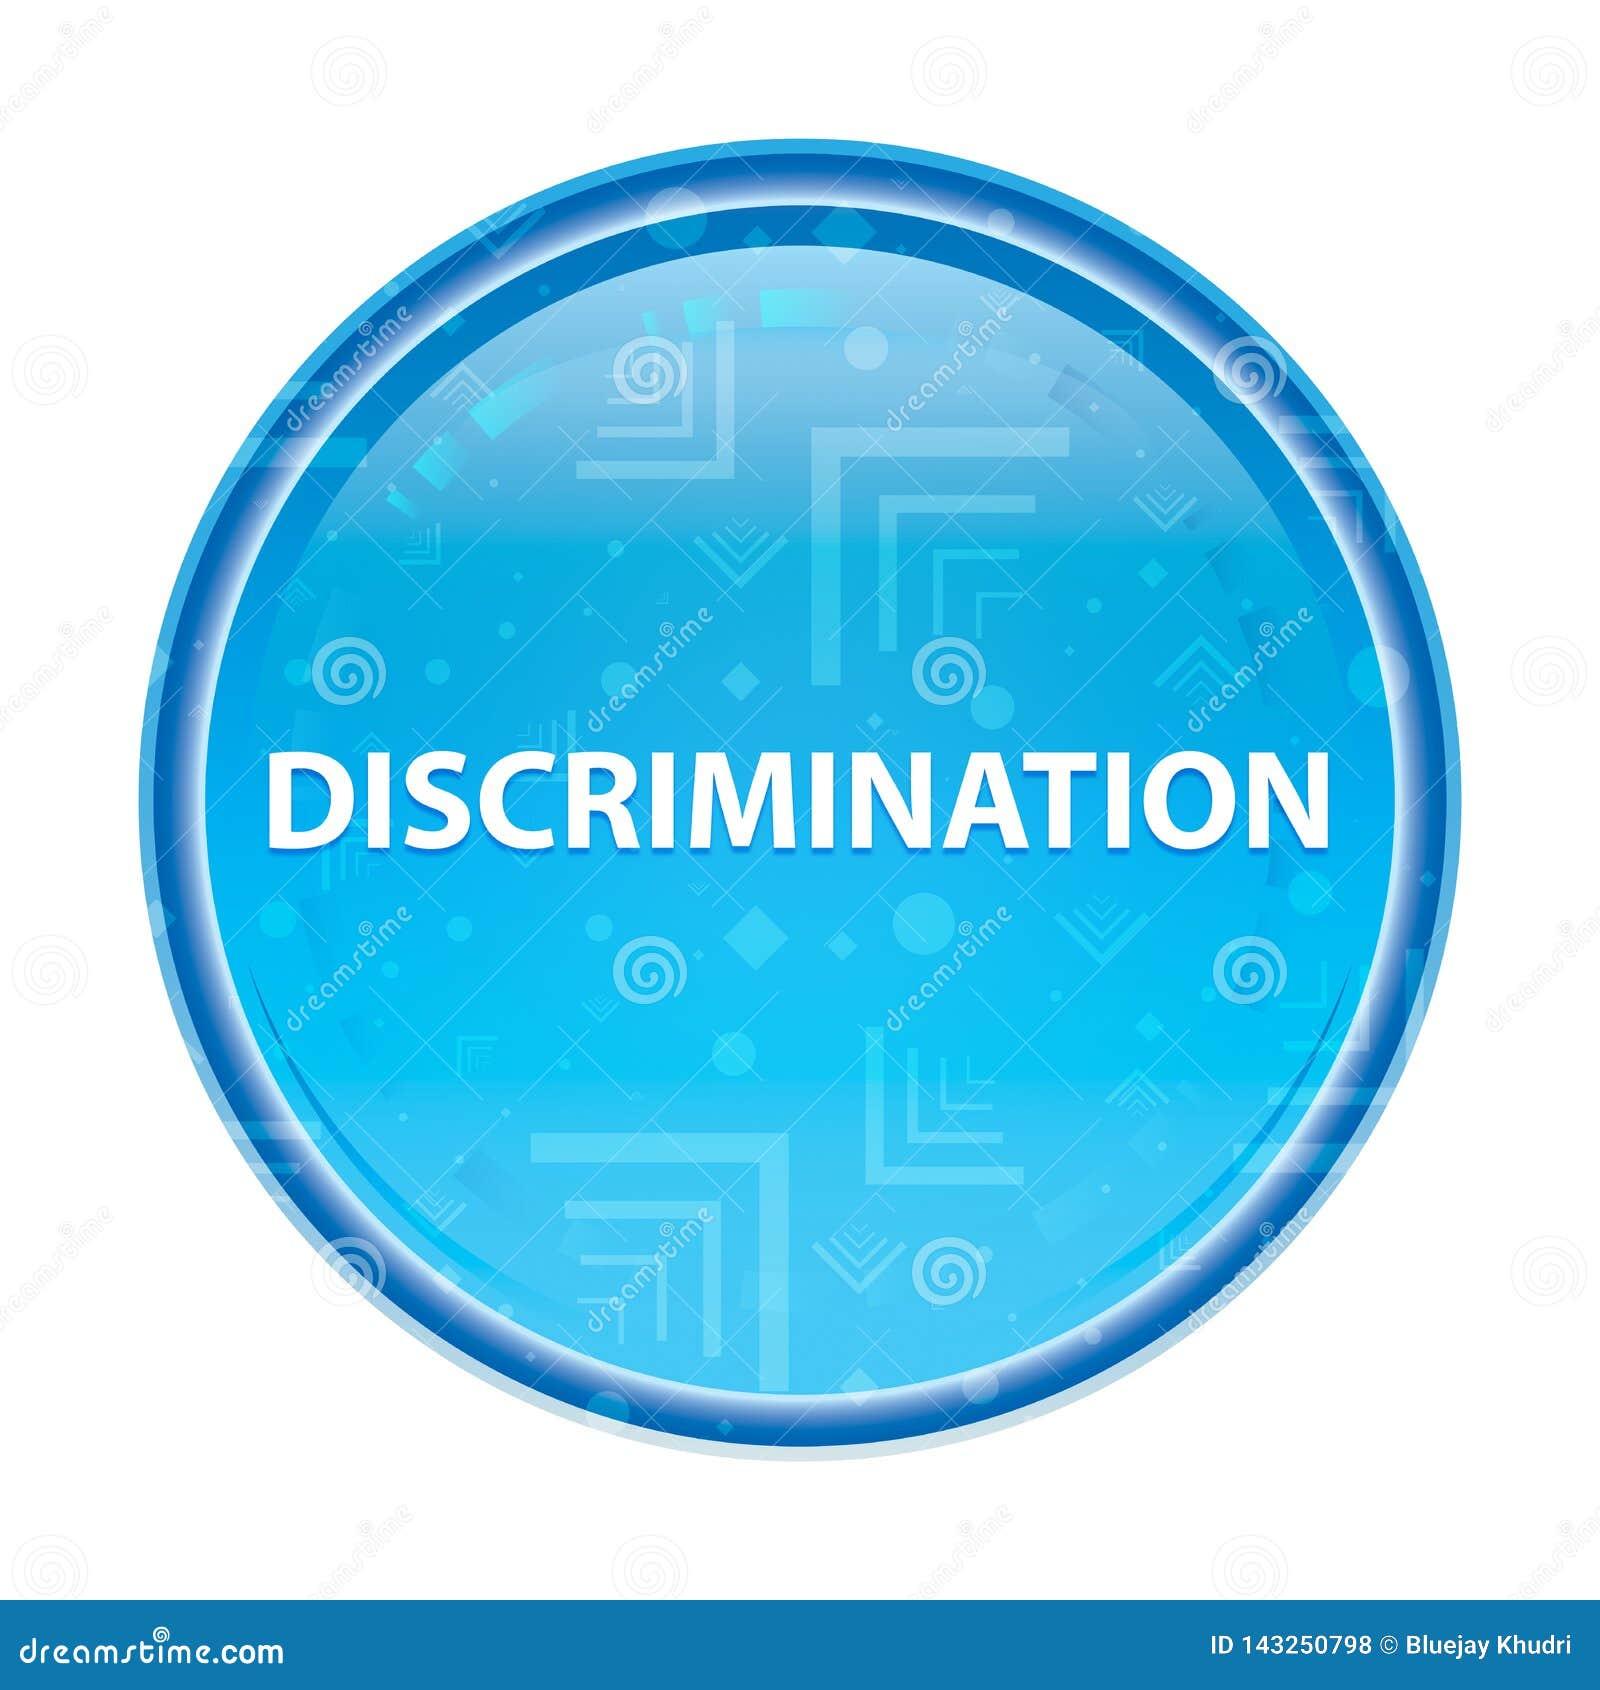 Discrimination floral blue round button